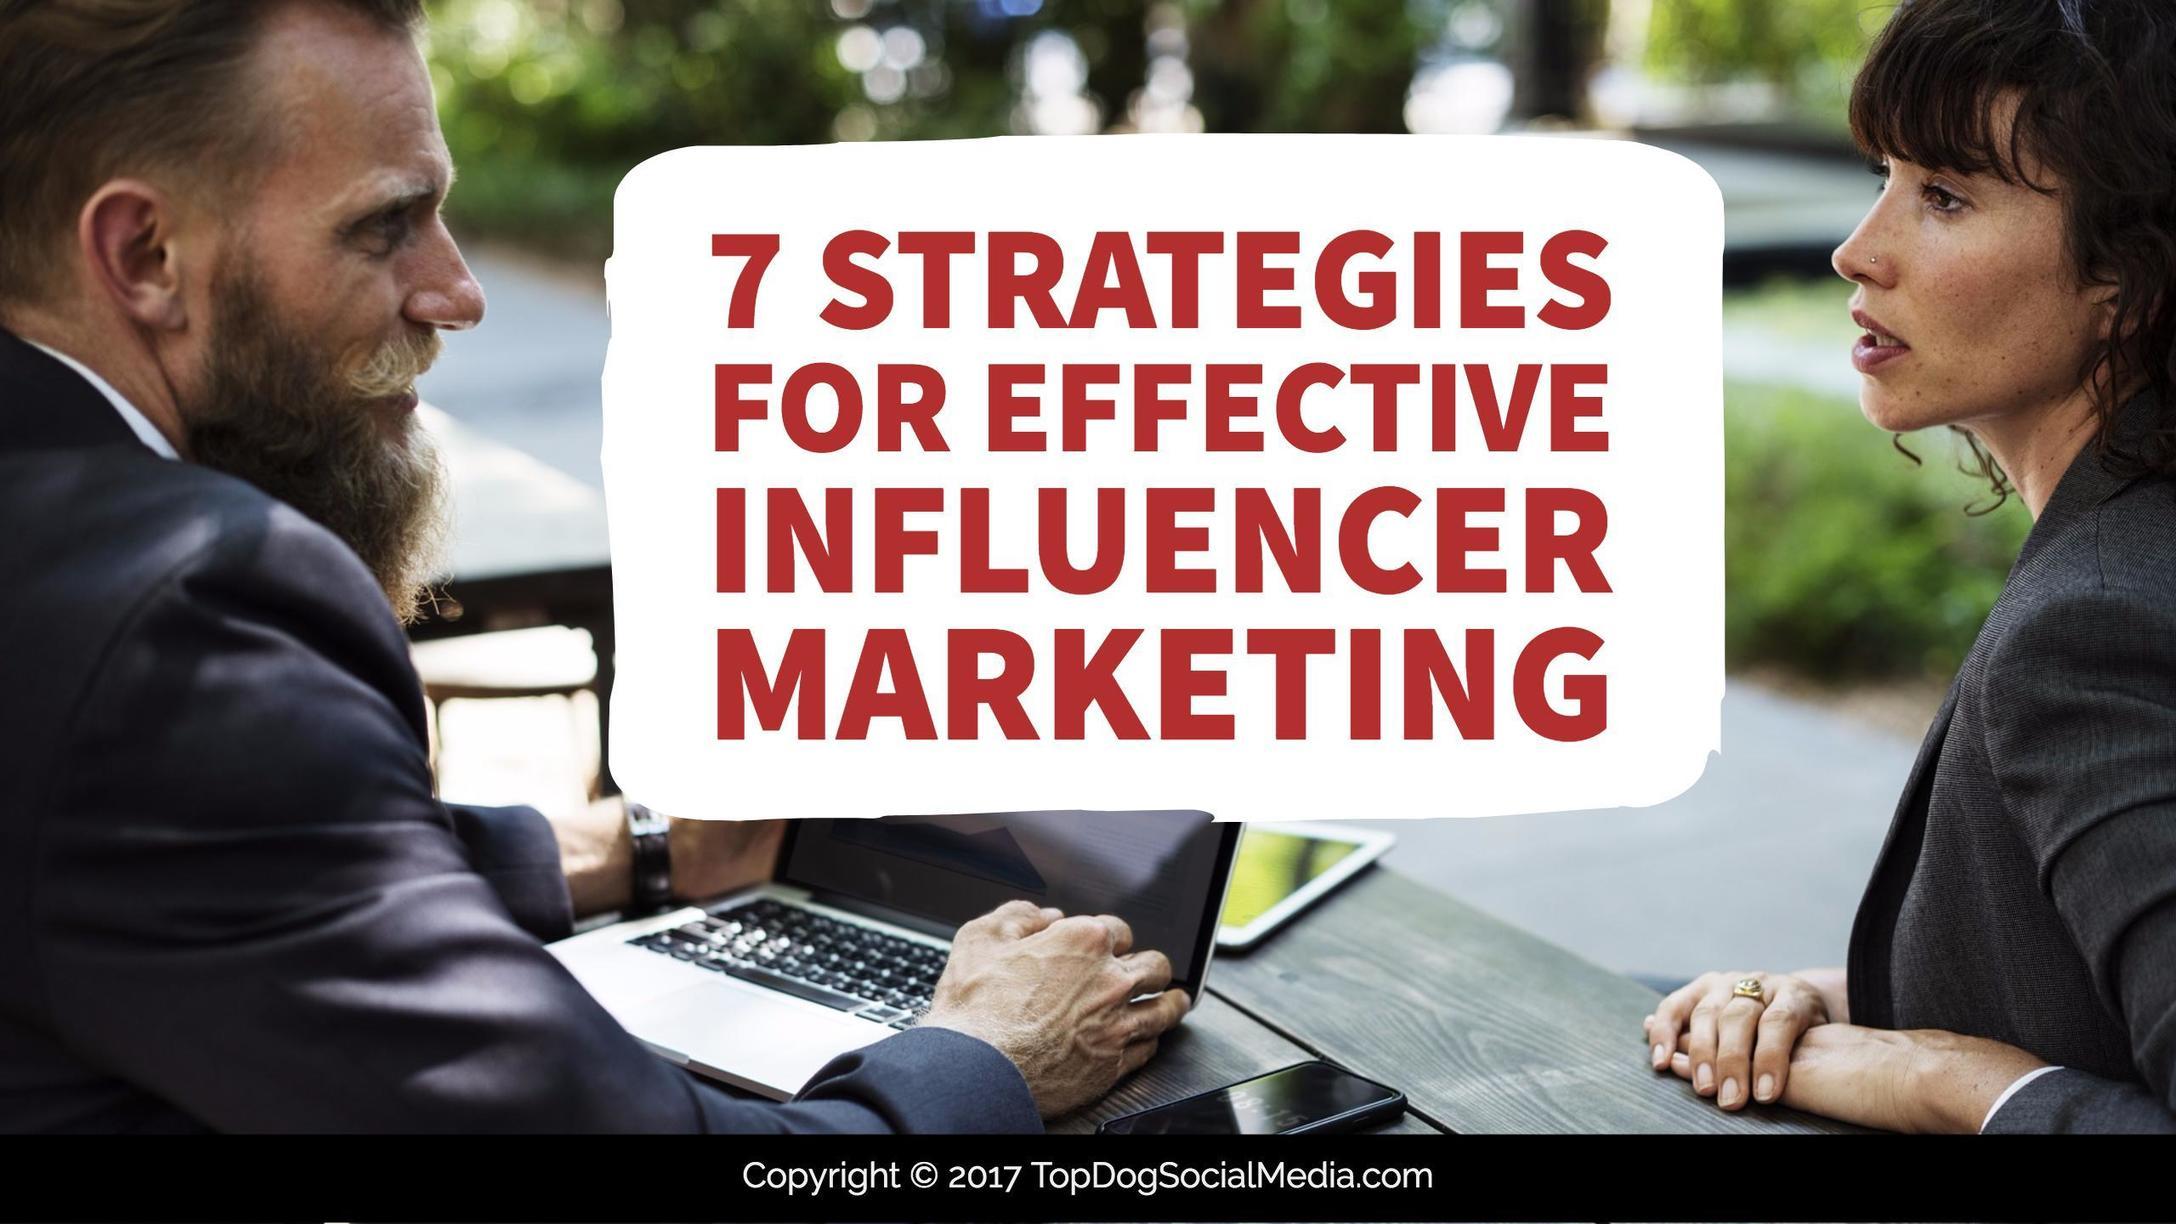 7 Strategies for Effective Influencer Marketing